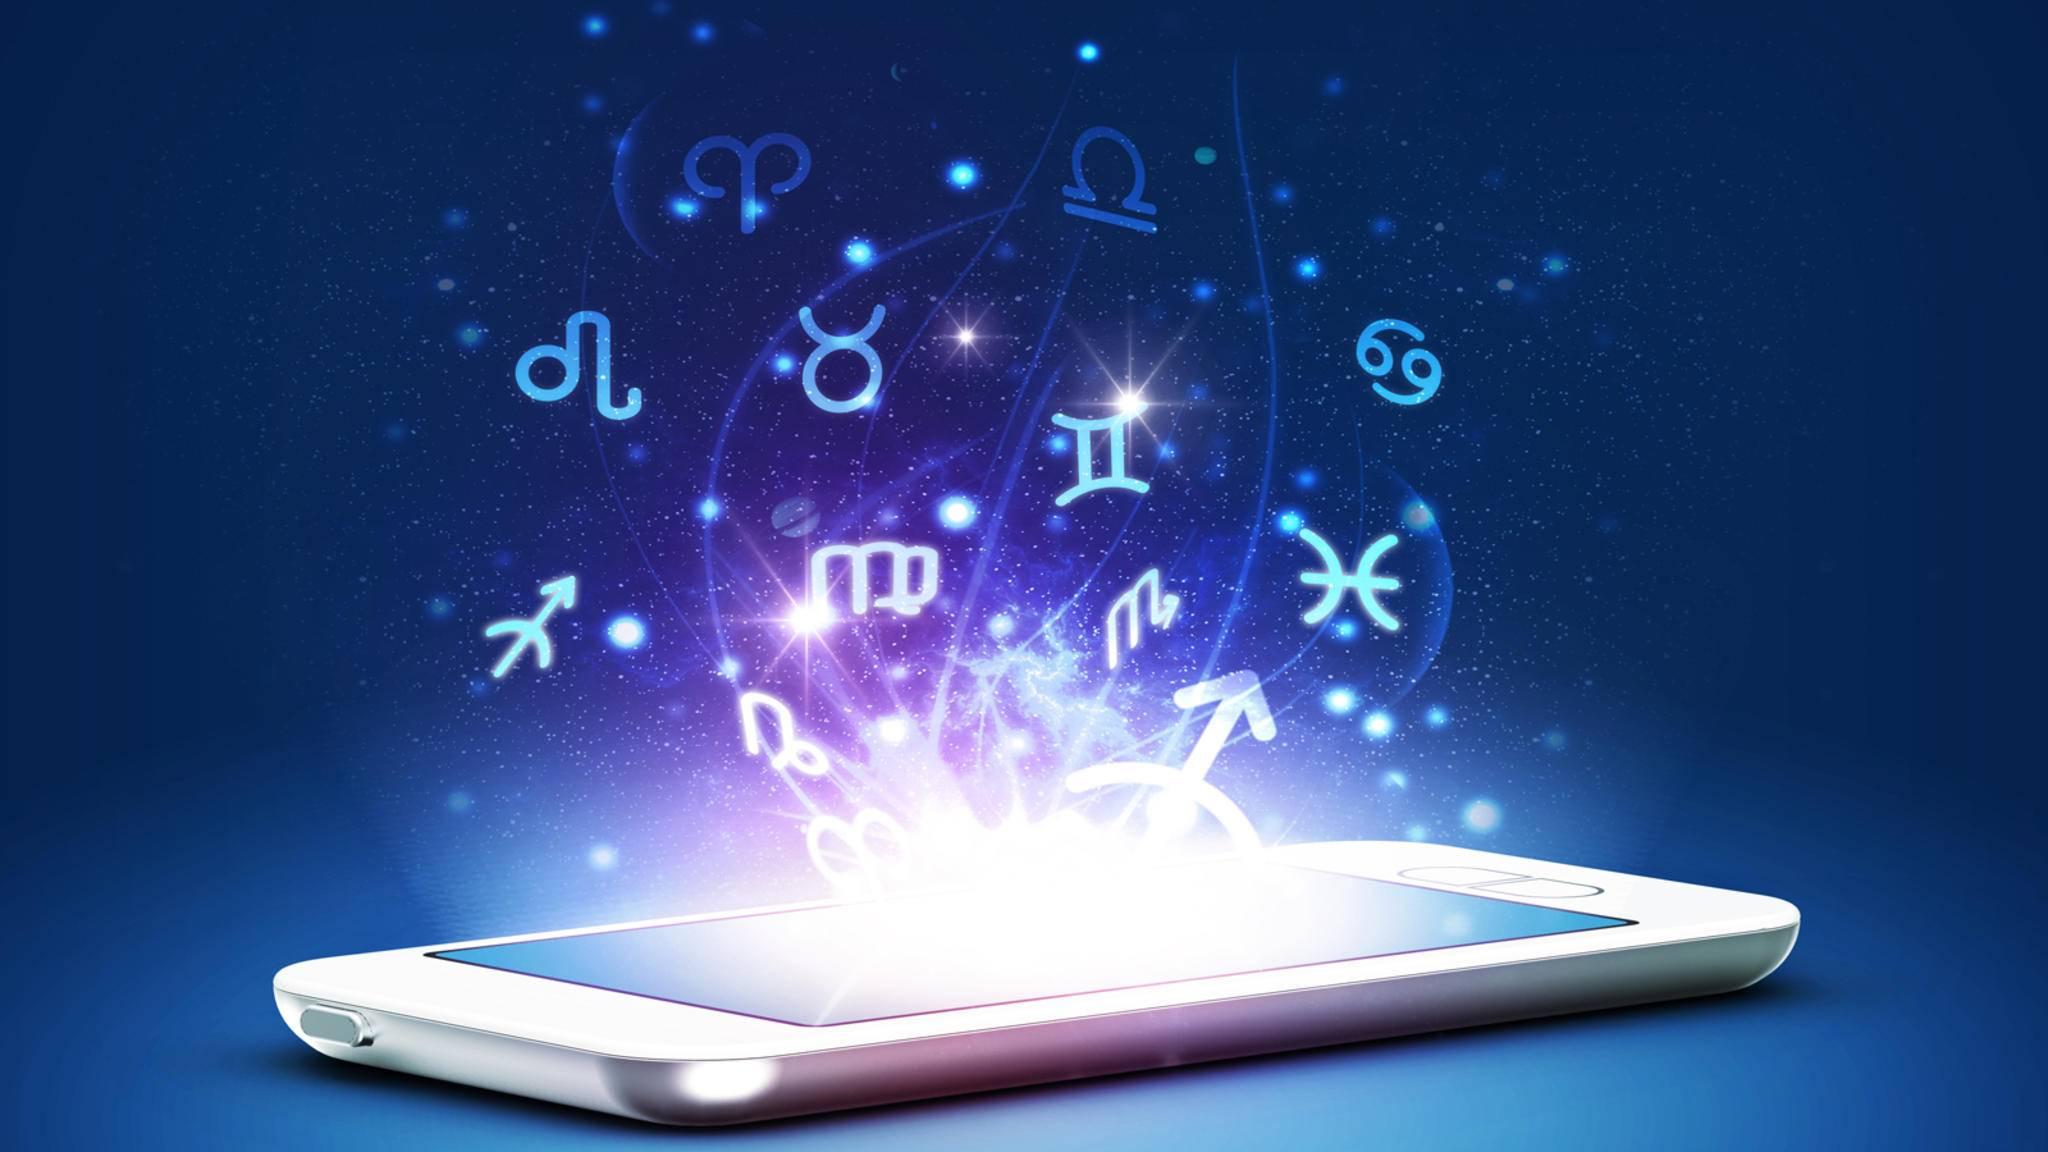 Mit den richtigen Horoskop-Apps holst Du Dir die astrologische Zukunft aufs Smartphone.